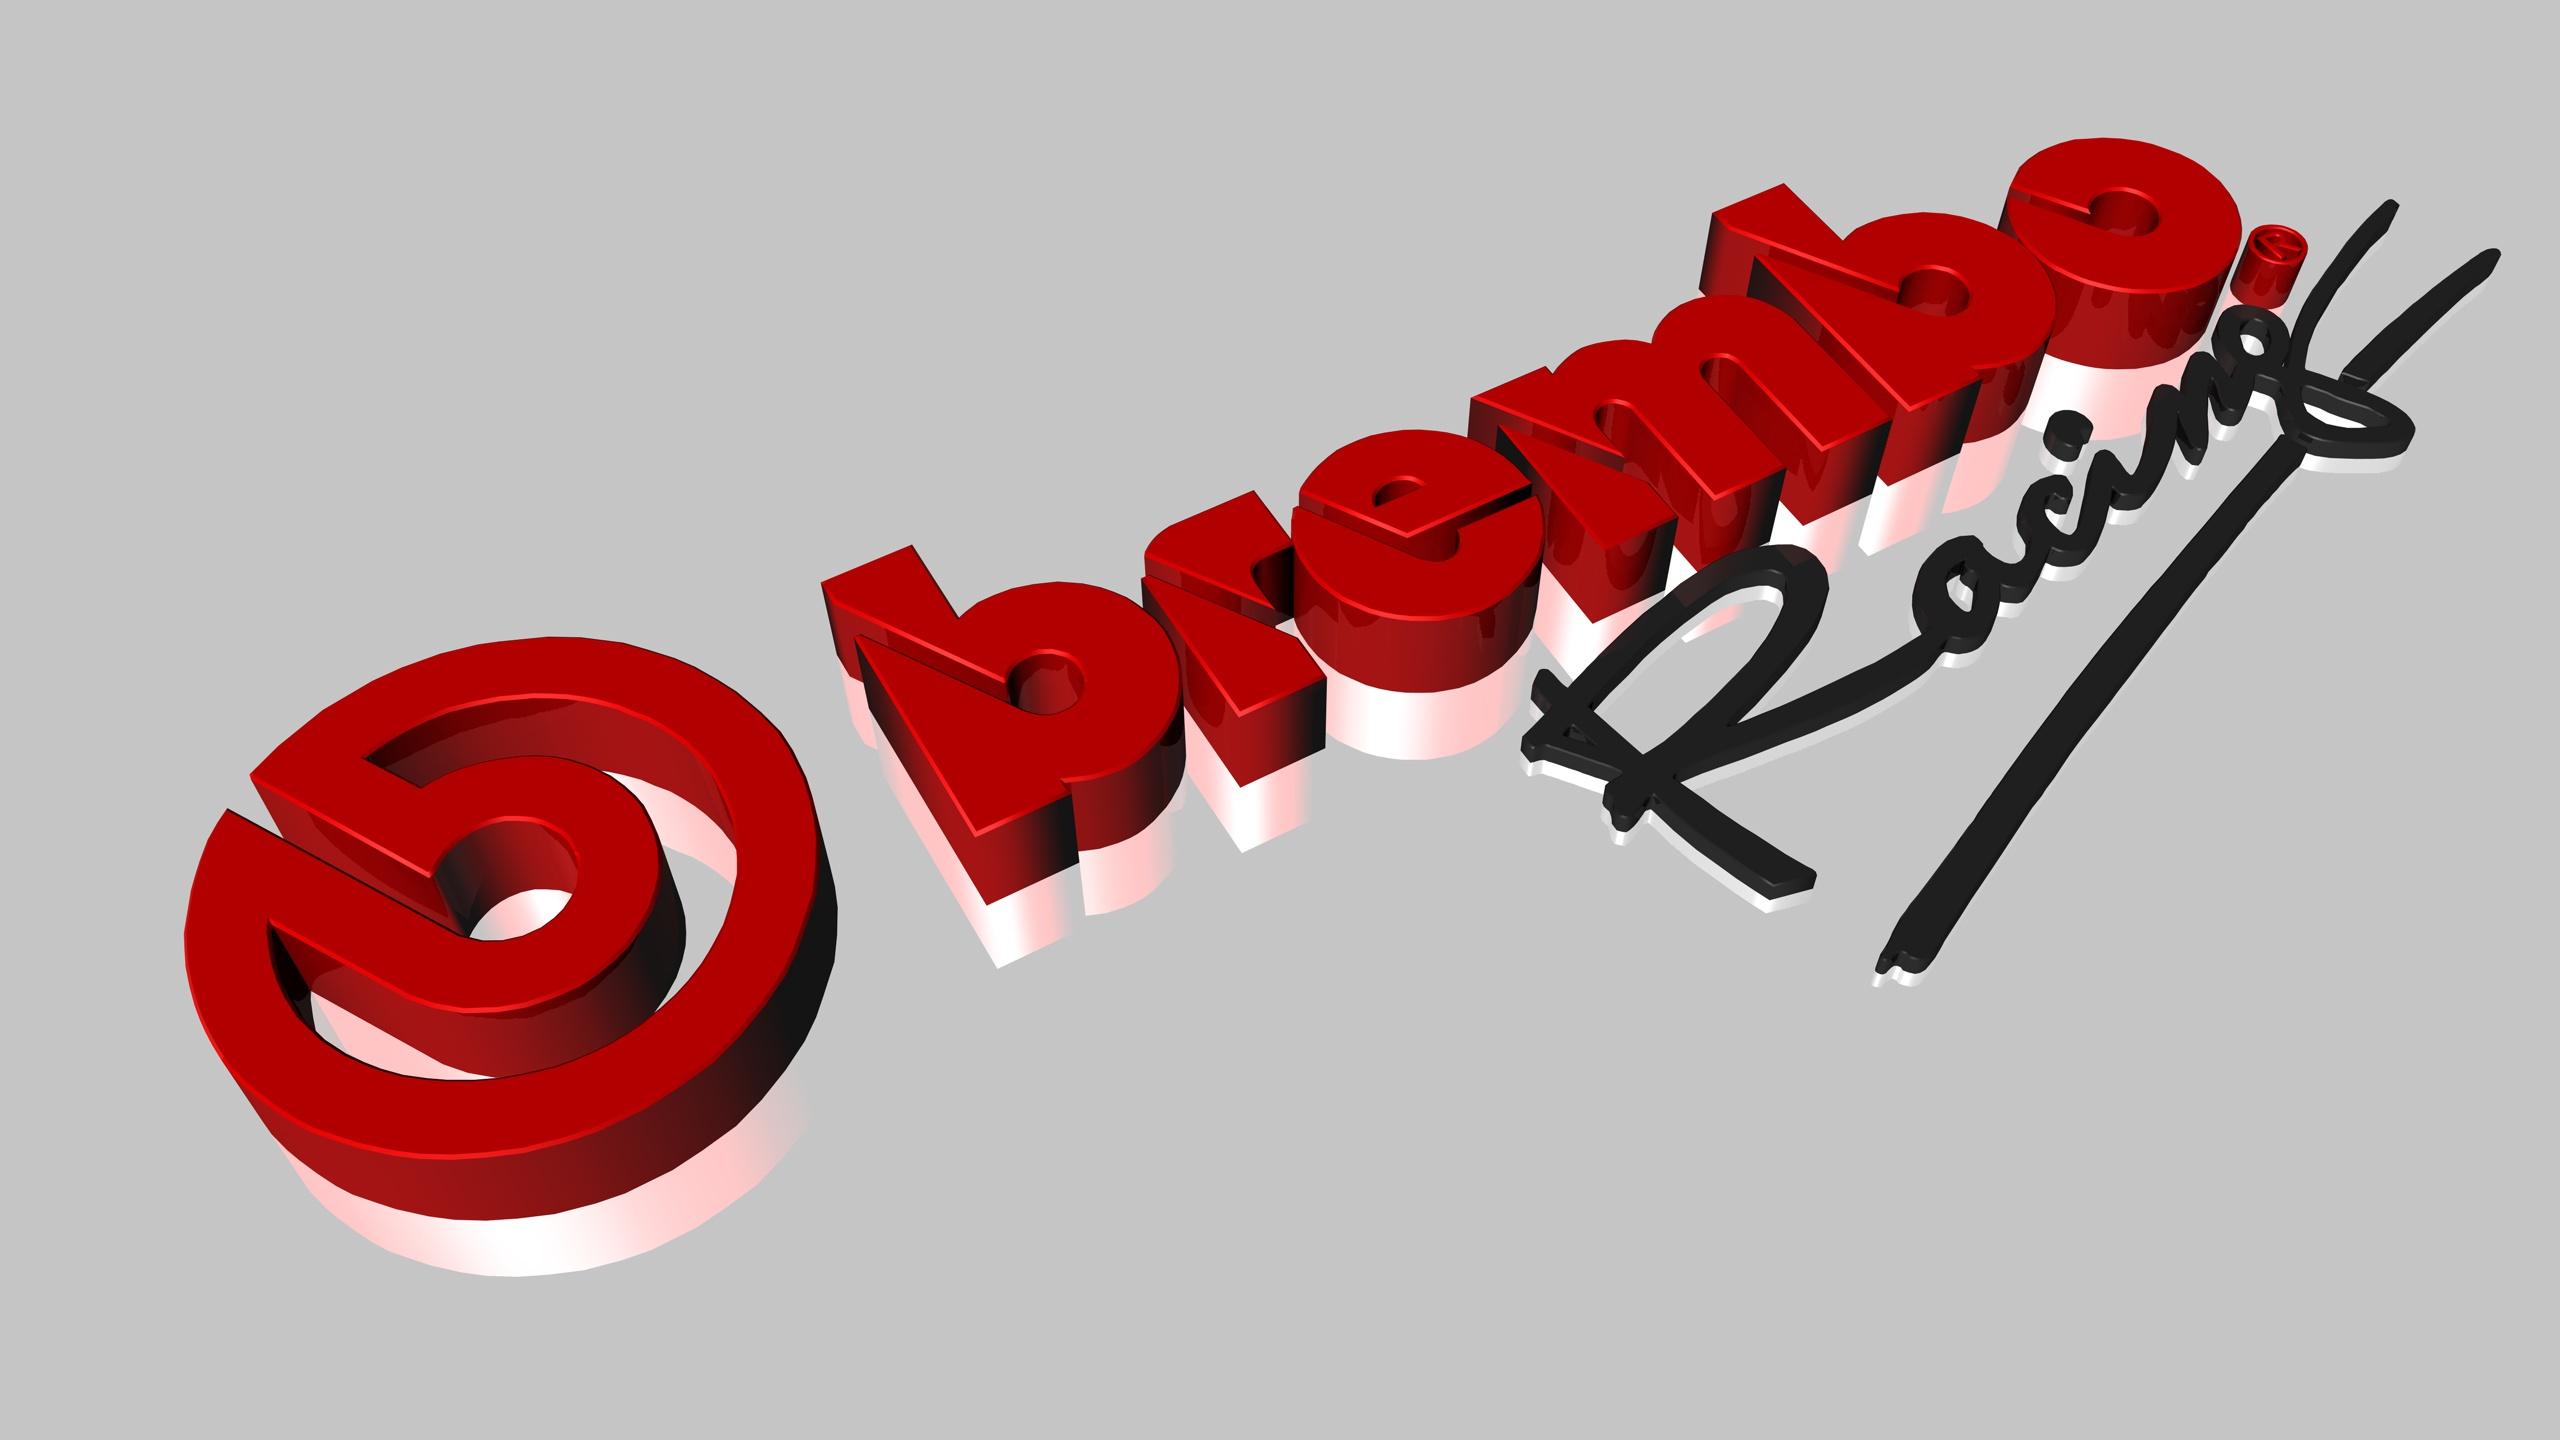 brembo racing 3D logo by badboy2kxxx brembo racing 3D logo by badboy2kxxx